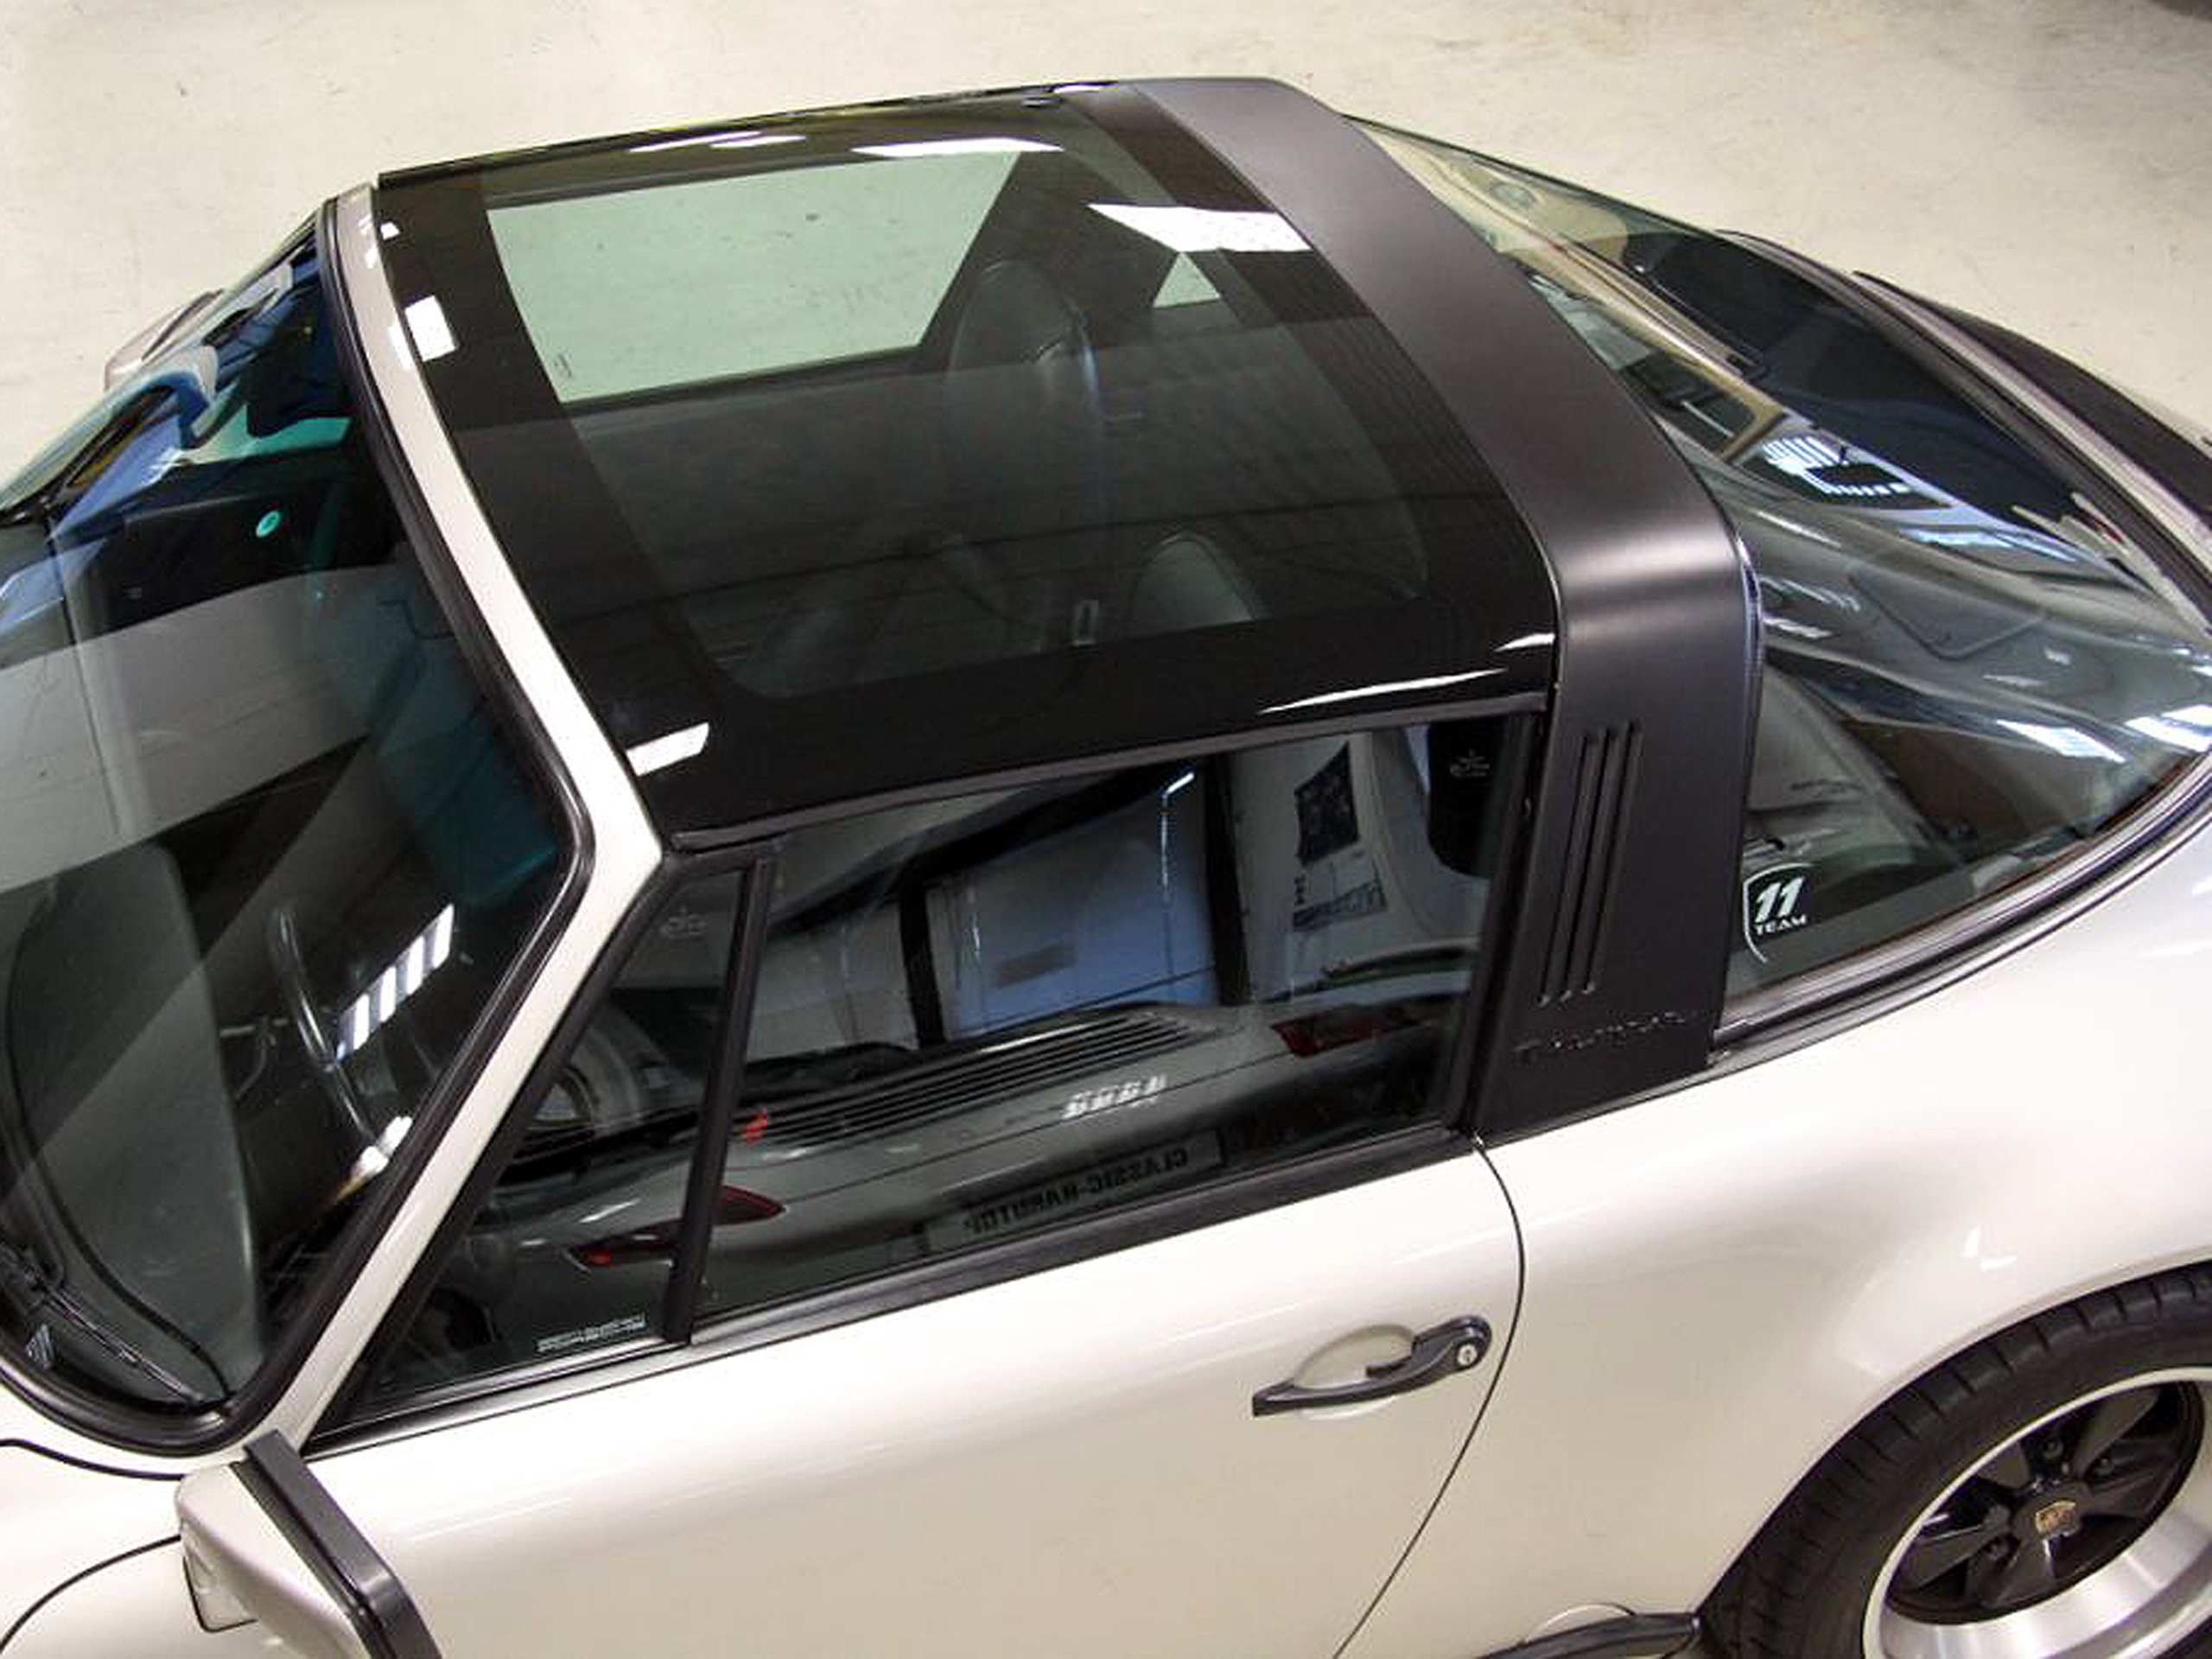 porsche 911 targa glasdach von gtn f r den klassiker. Black Bedroom Furniture Sets. Home Design Ideas